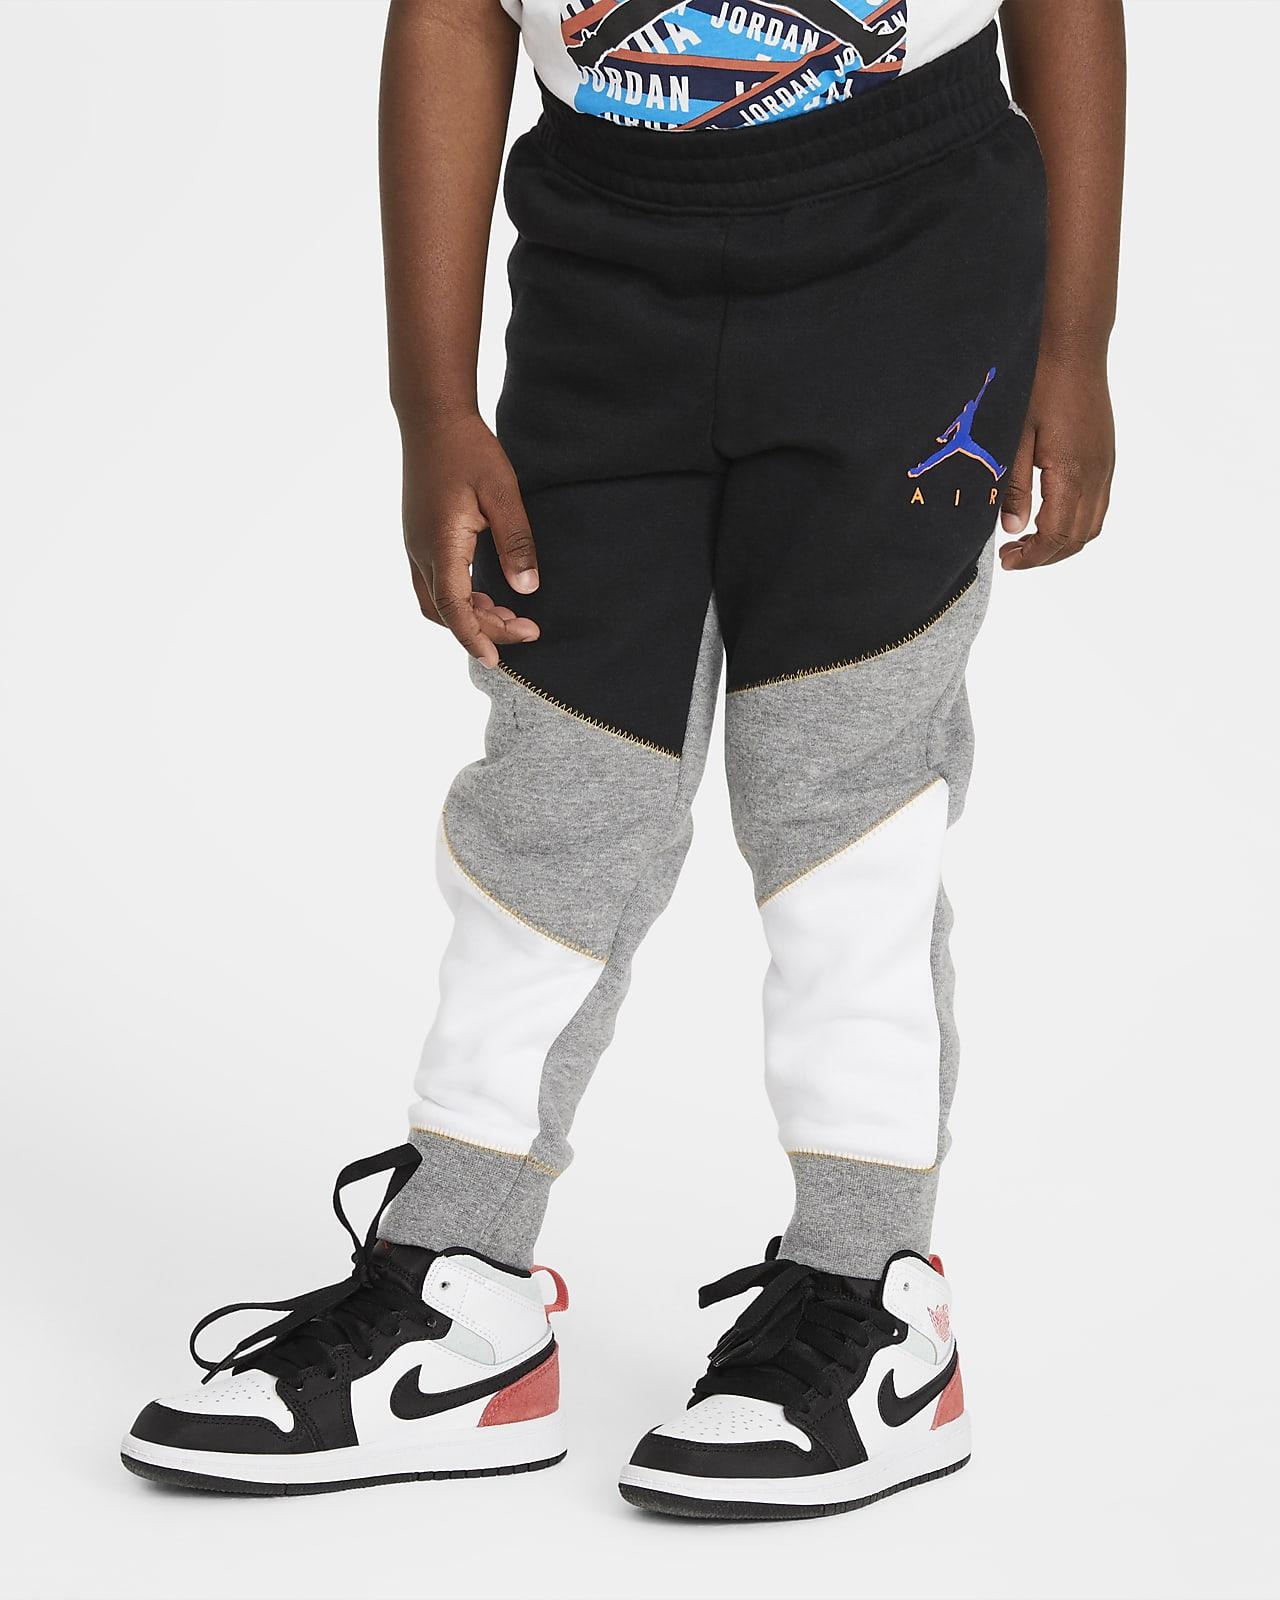 Jordan Toddler Fleece Pants